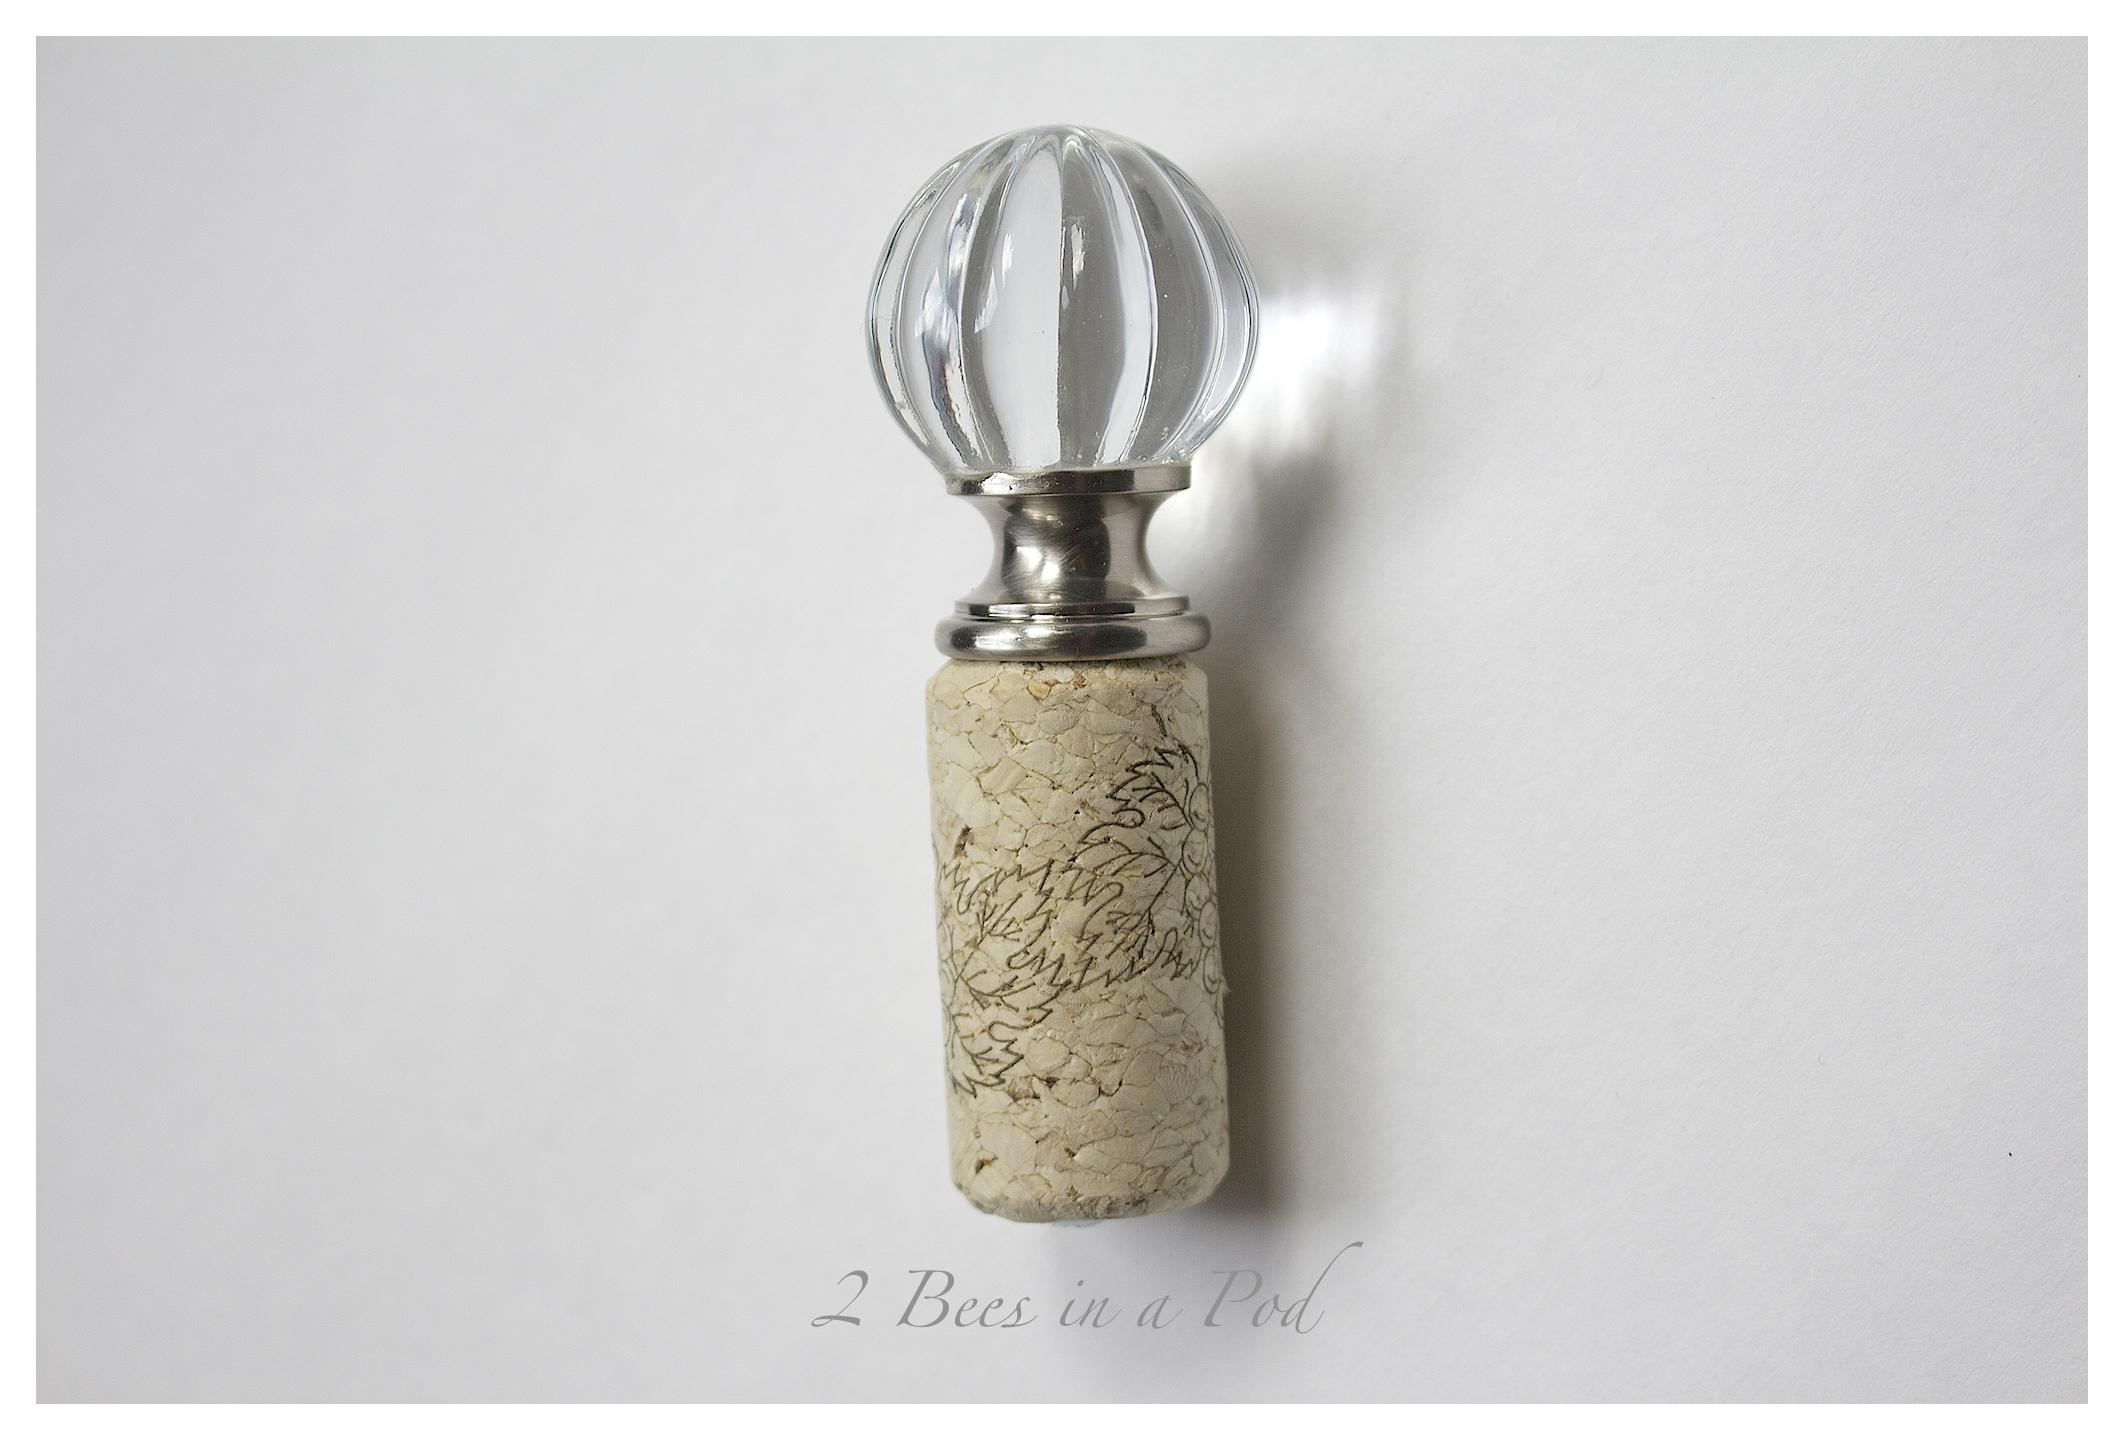 DIY Wine Bottle Stopper - perfect gift idea!